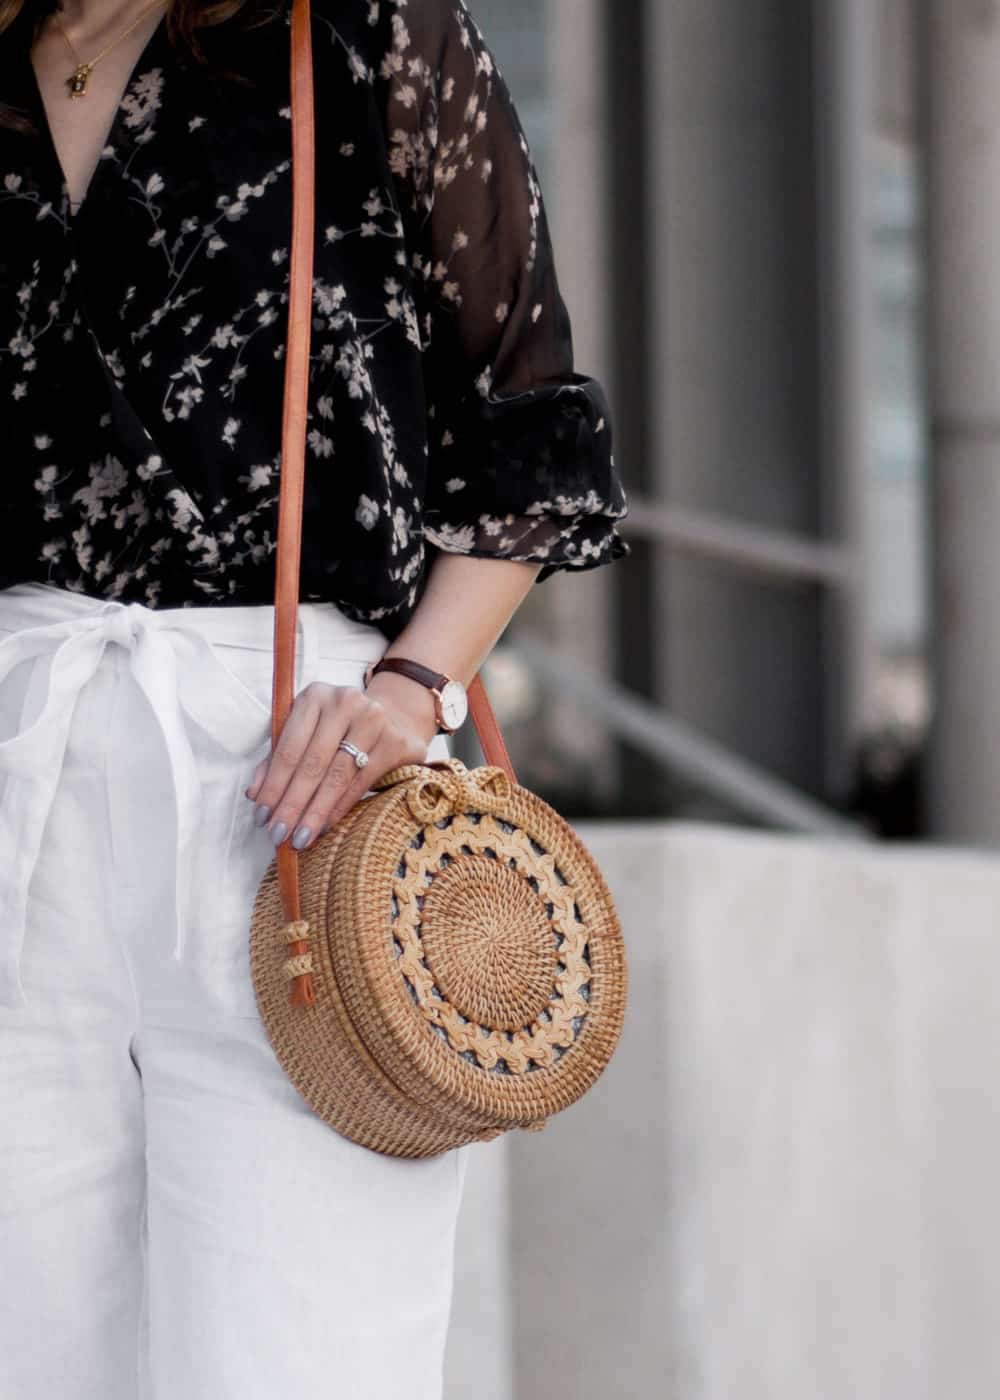 #OOTD details - Bali round wicker bag and Daniel Wellington Petite watch